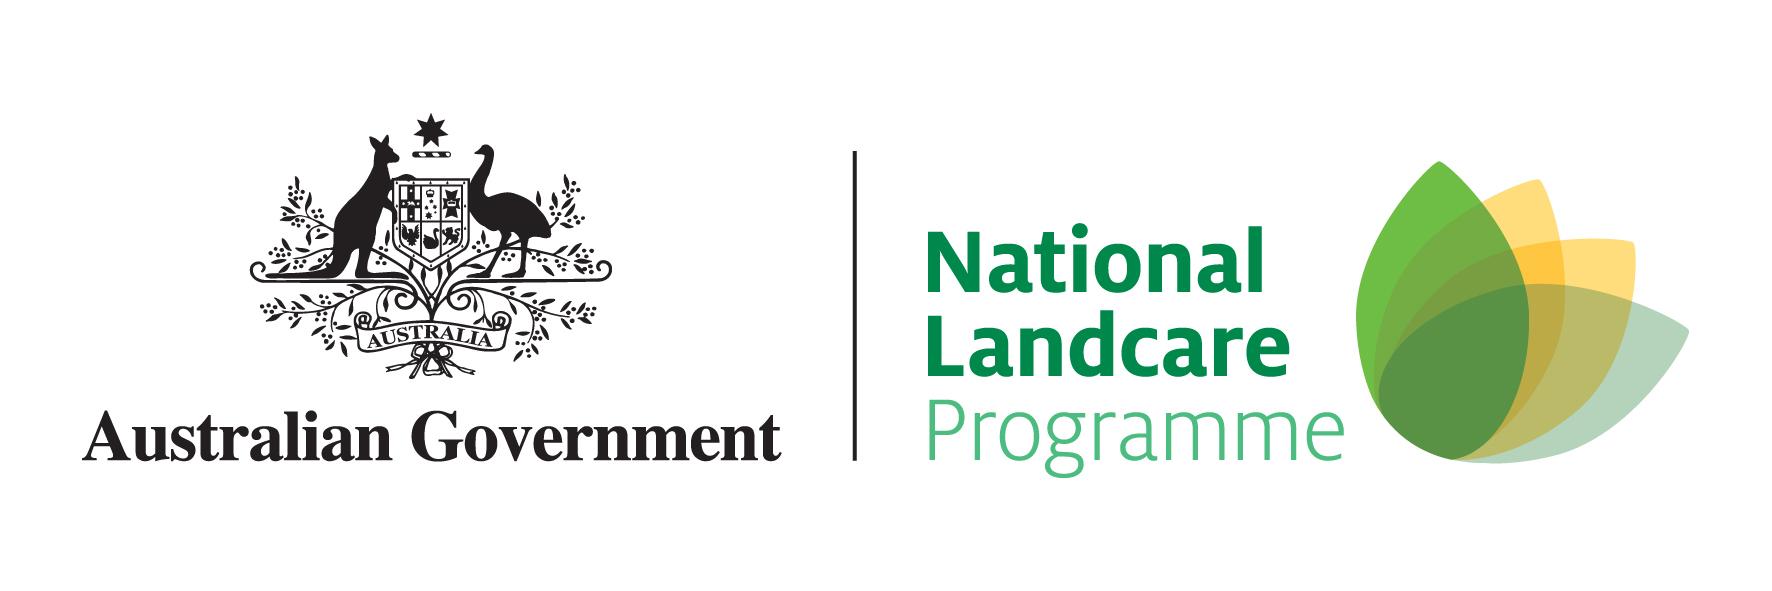 National_Landcare_logo-rgb.jpg